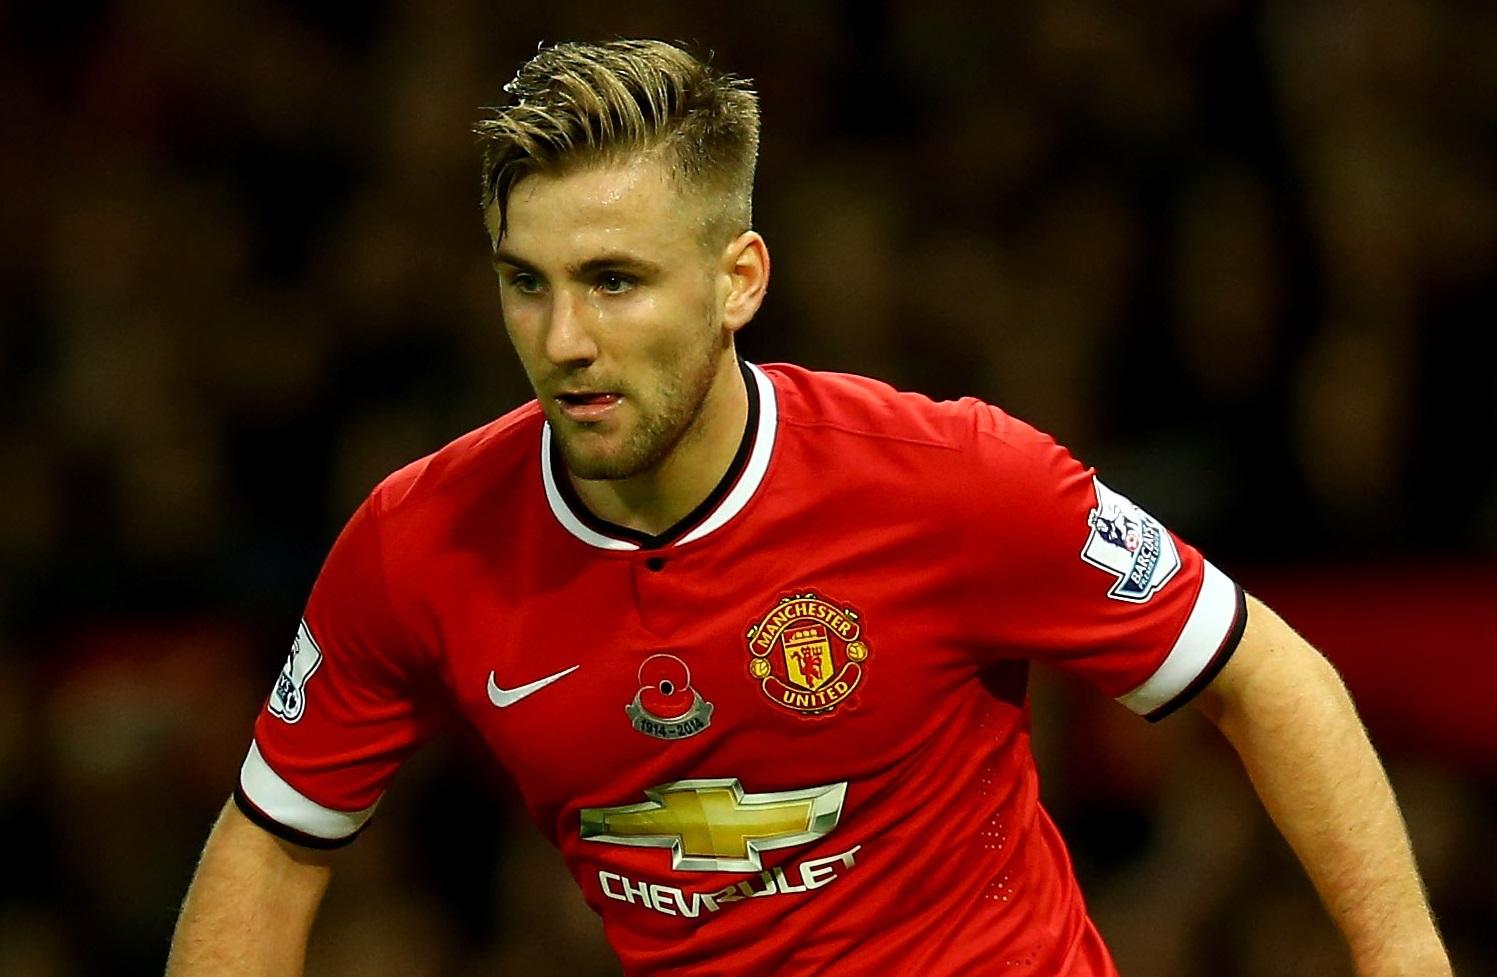 Shaw Akan Sabar Menanti Hadirnya Peluang Merumput Bagi United 1